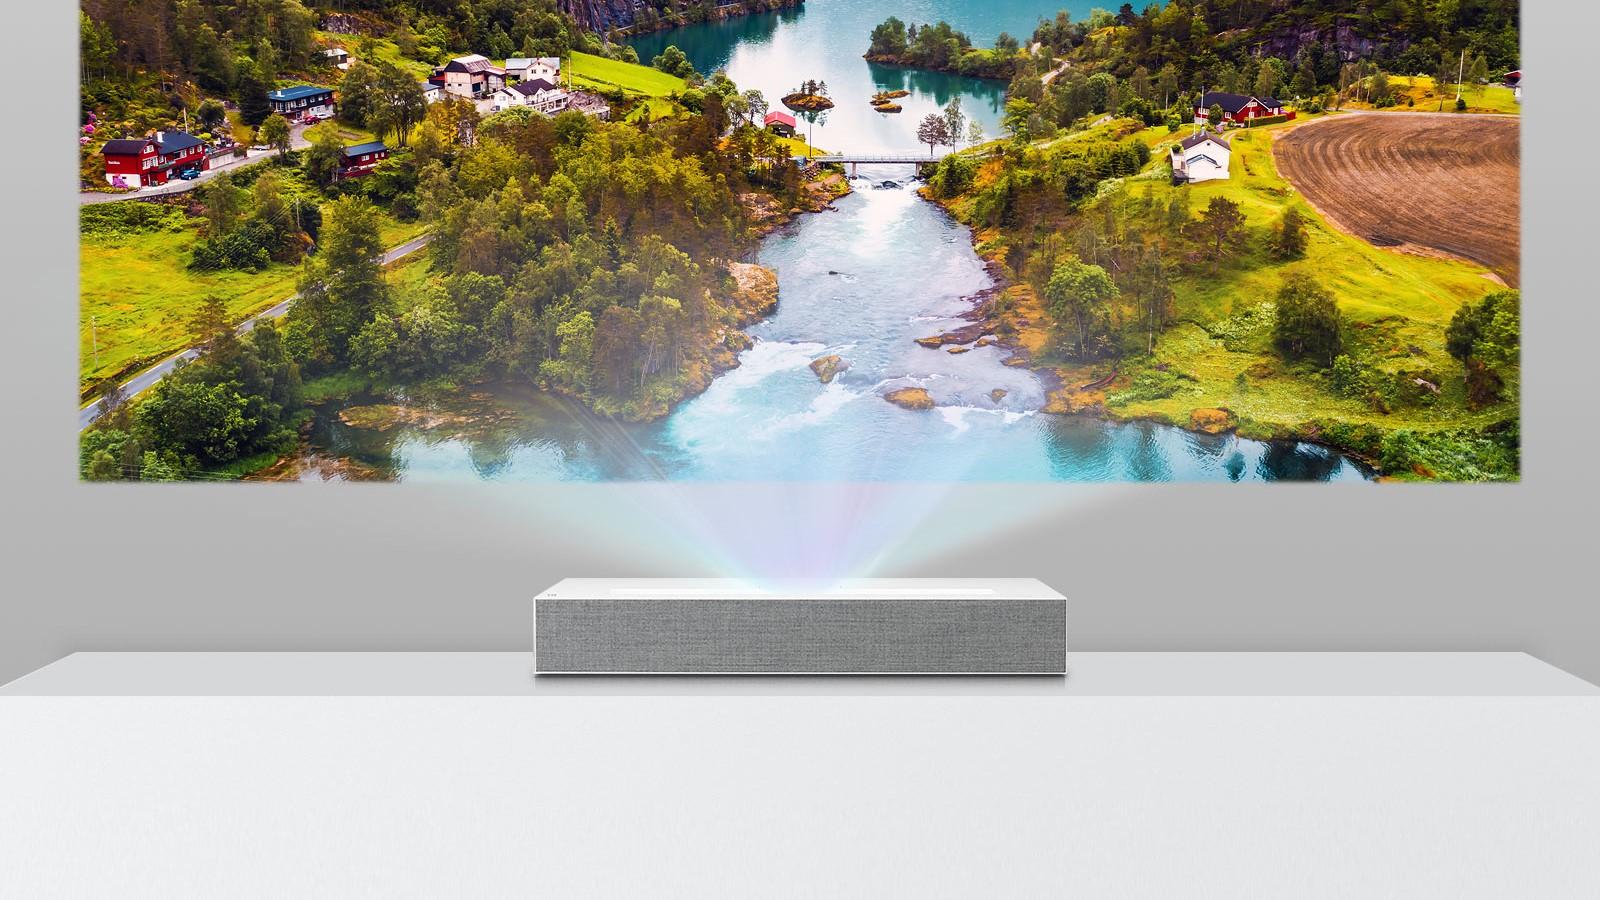 LG HU85LA CineBeam Projector